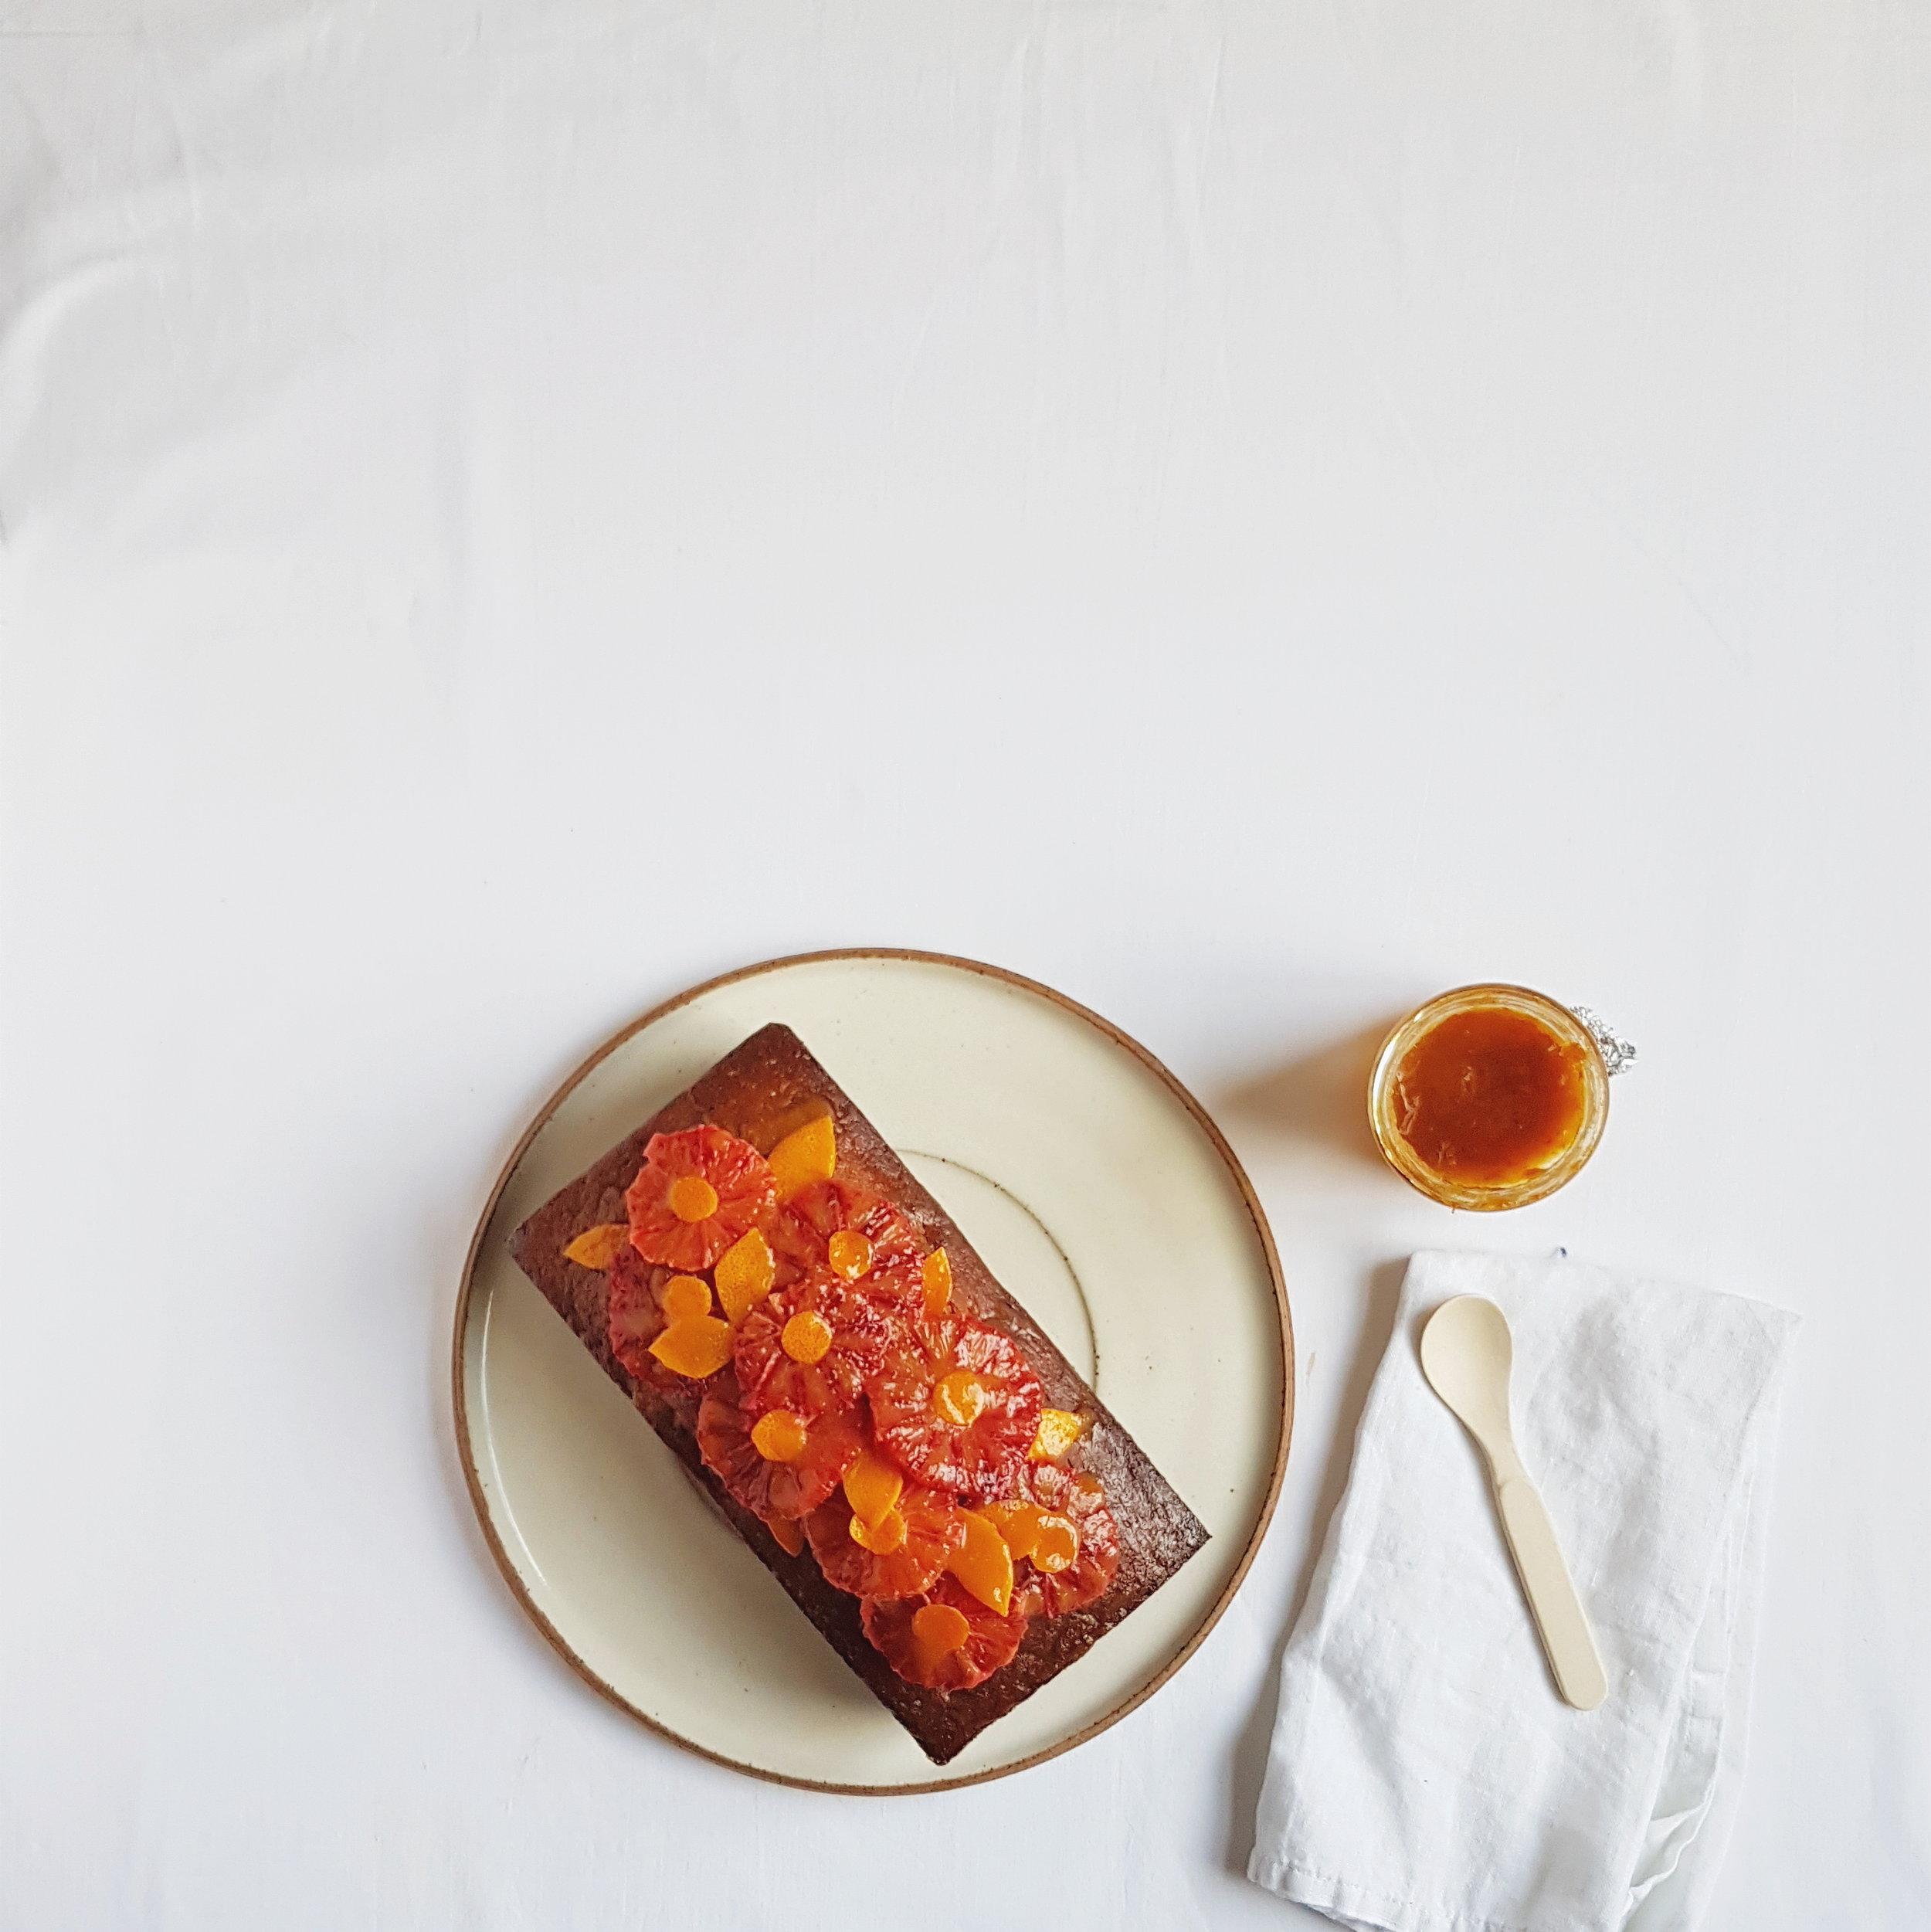 Blood orange + marmalade cake